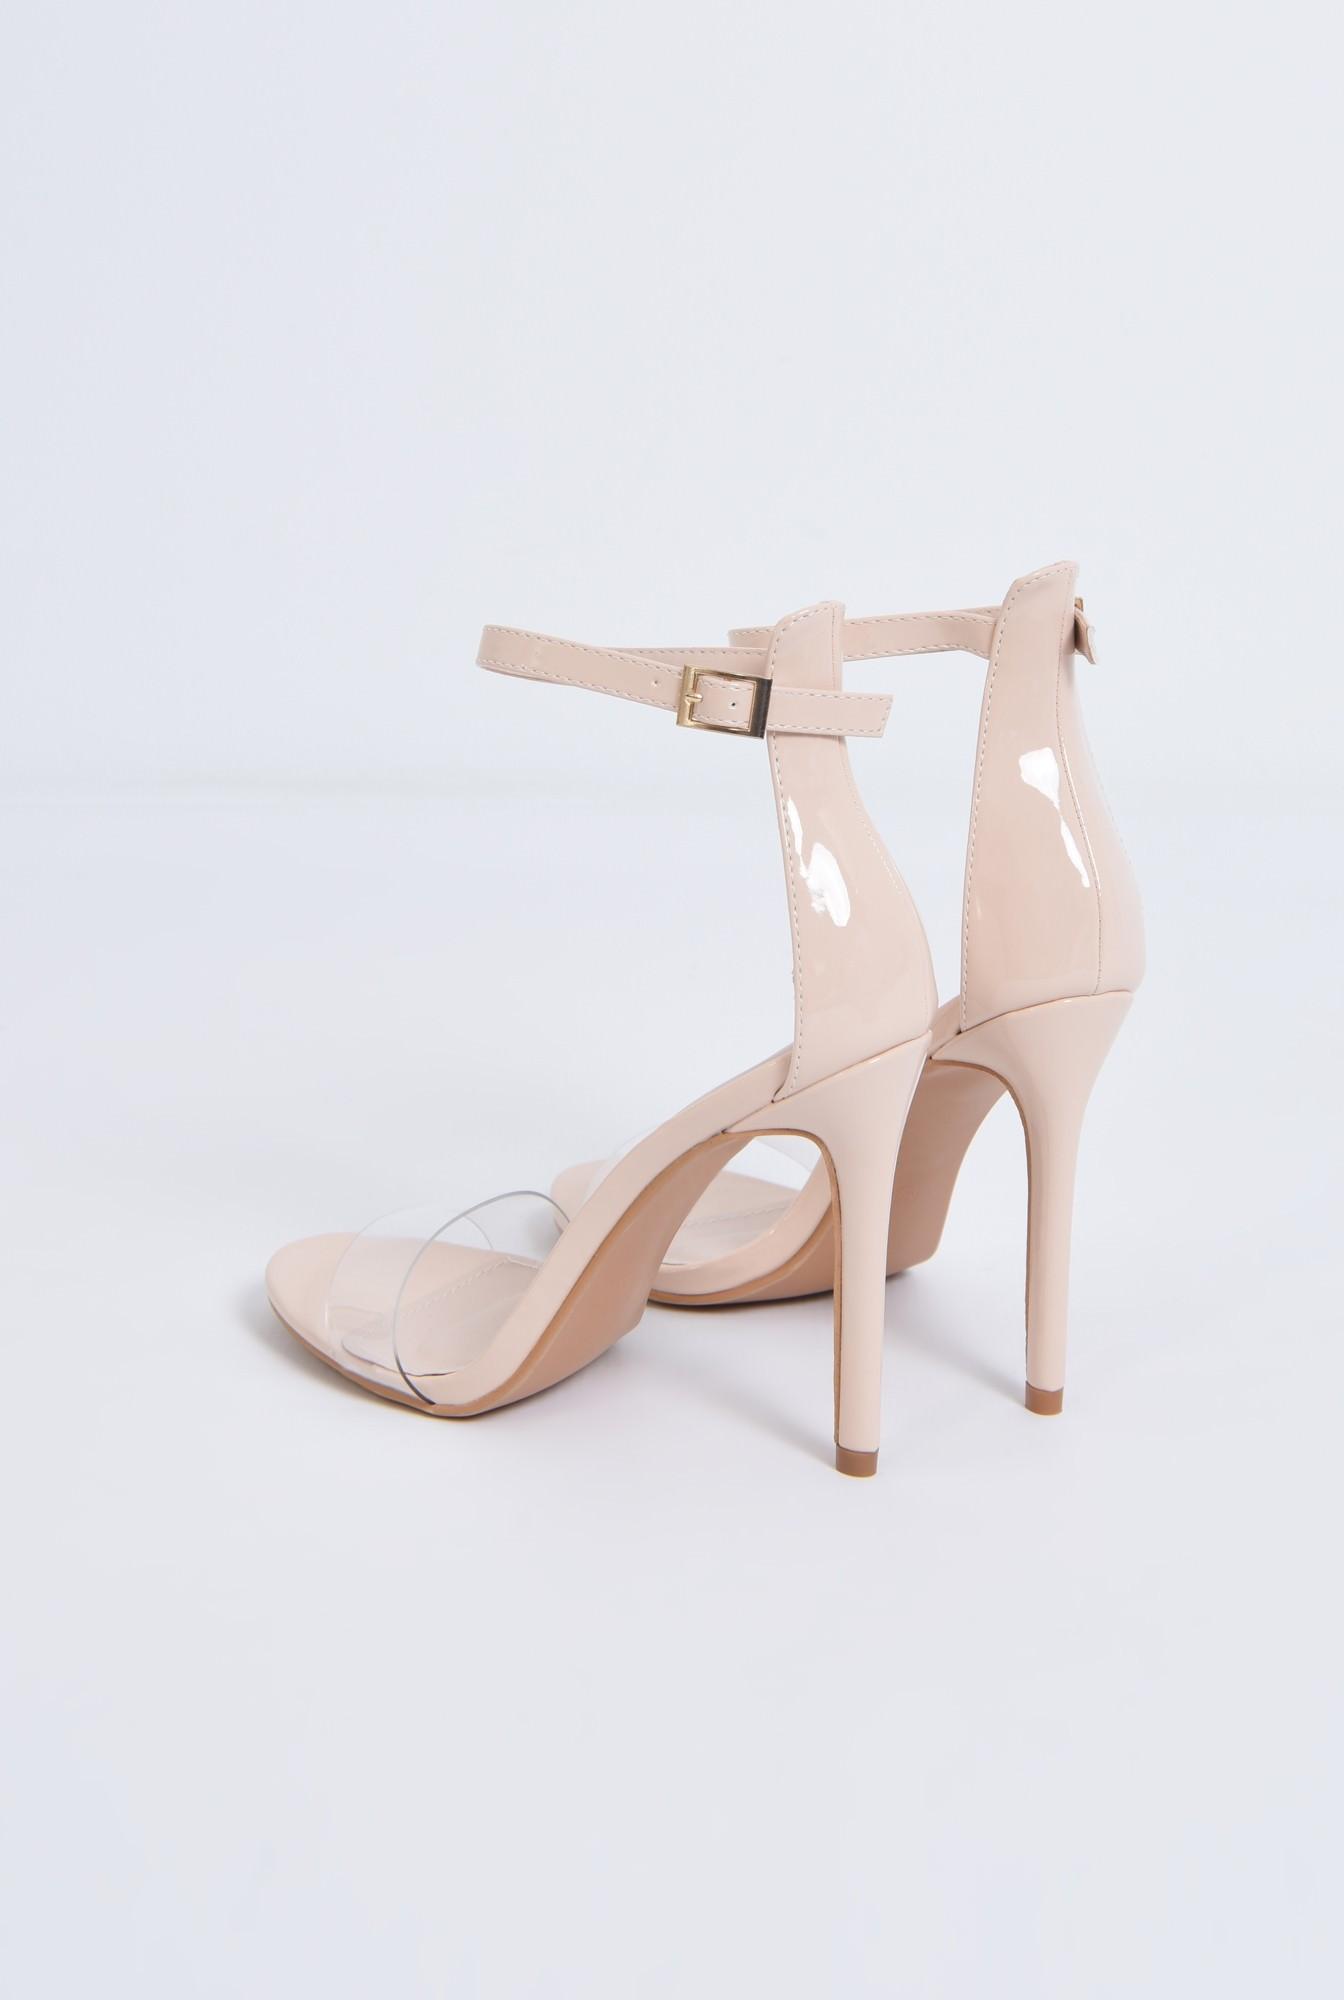 4 - sandale elegante, nude, lac, stiletto